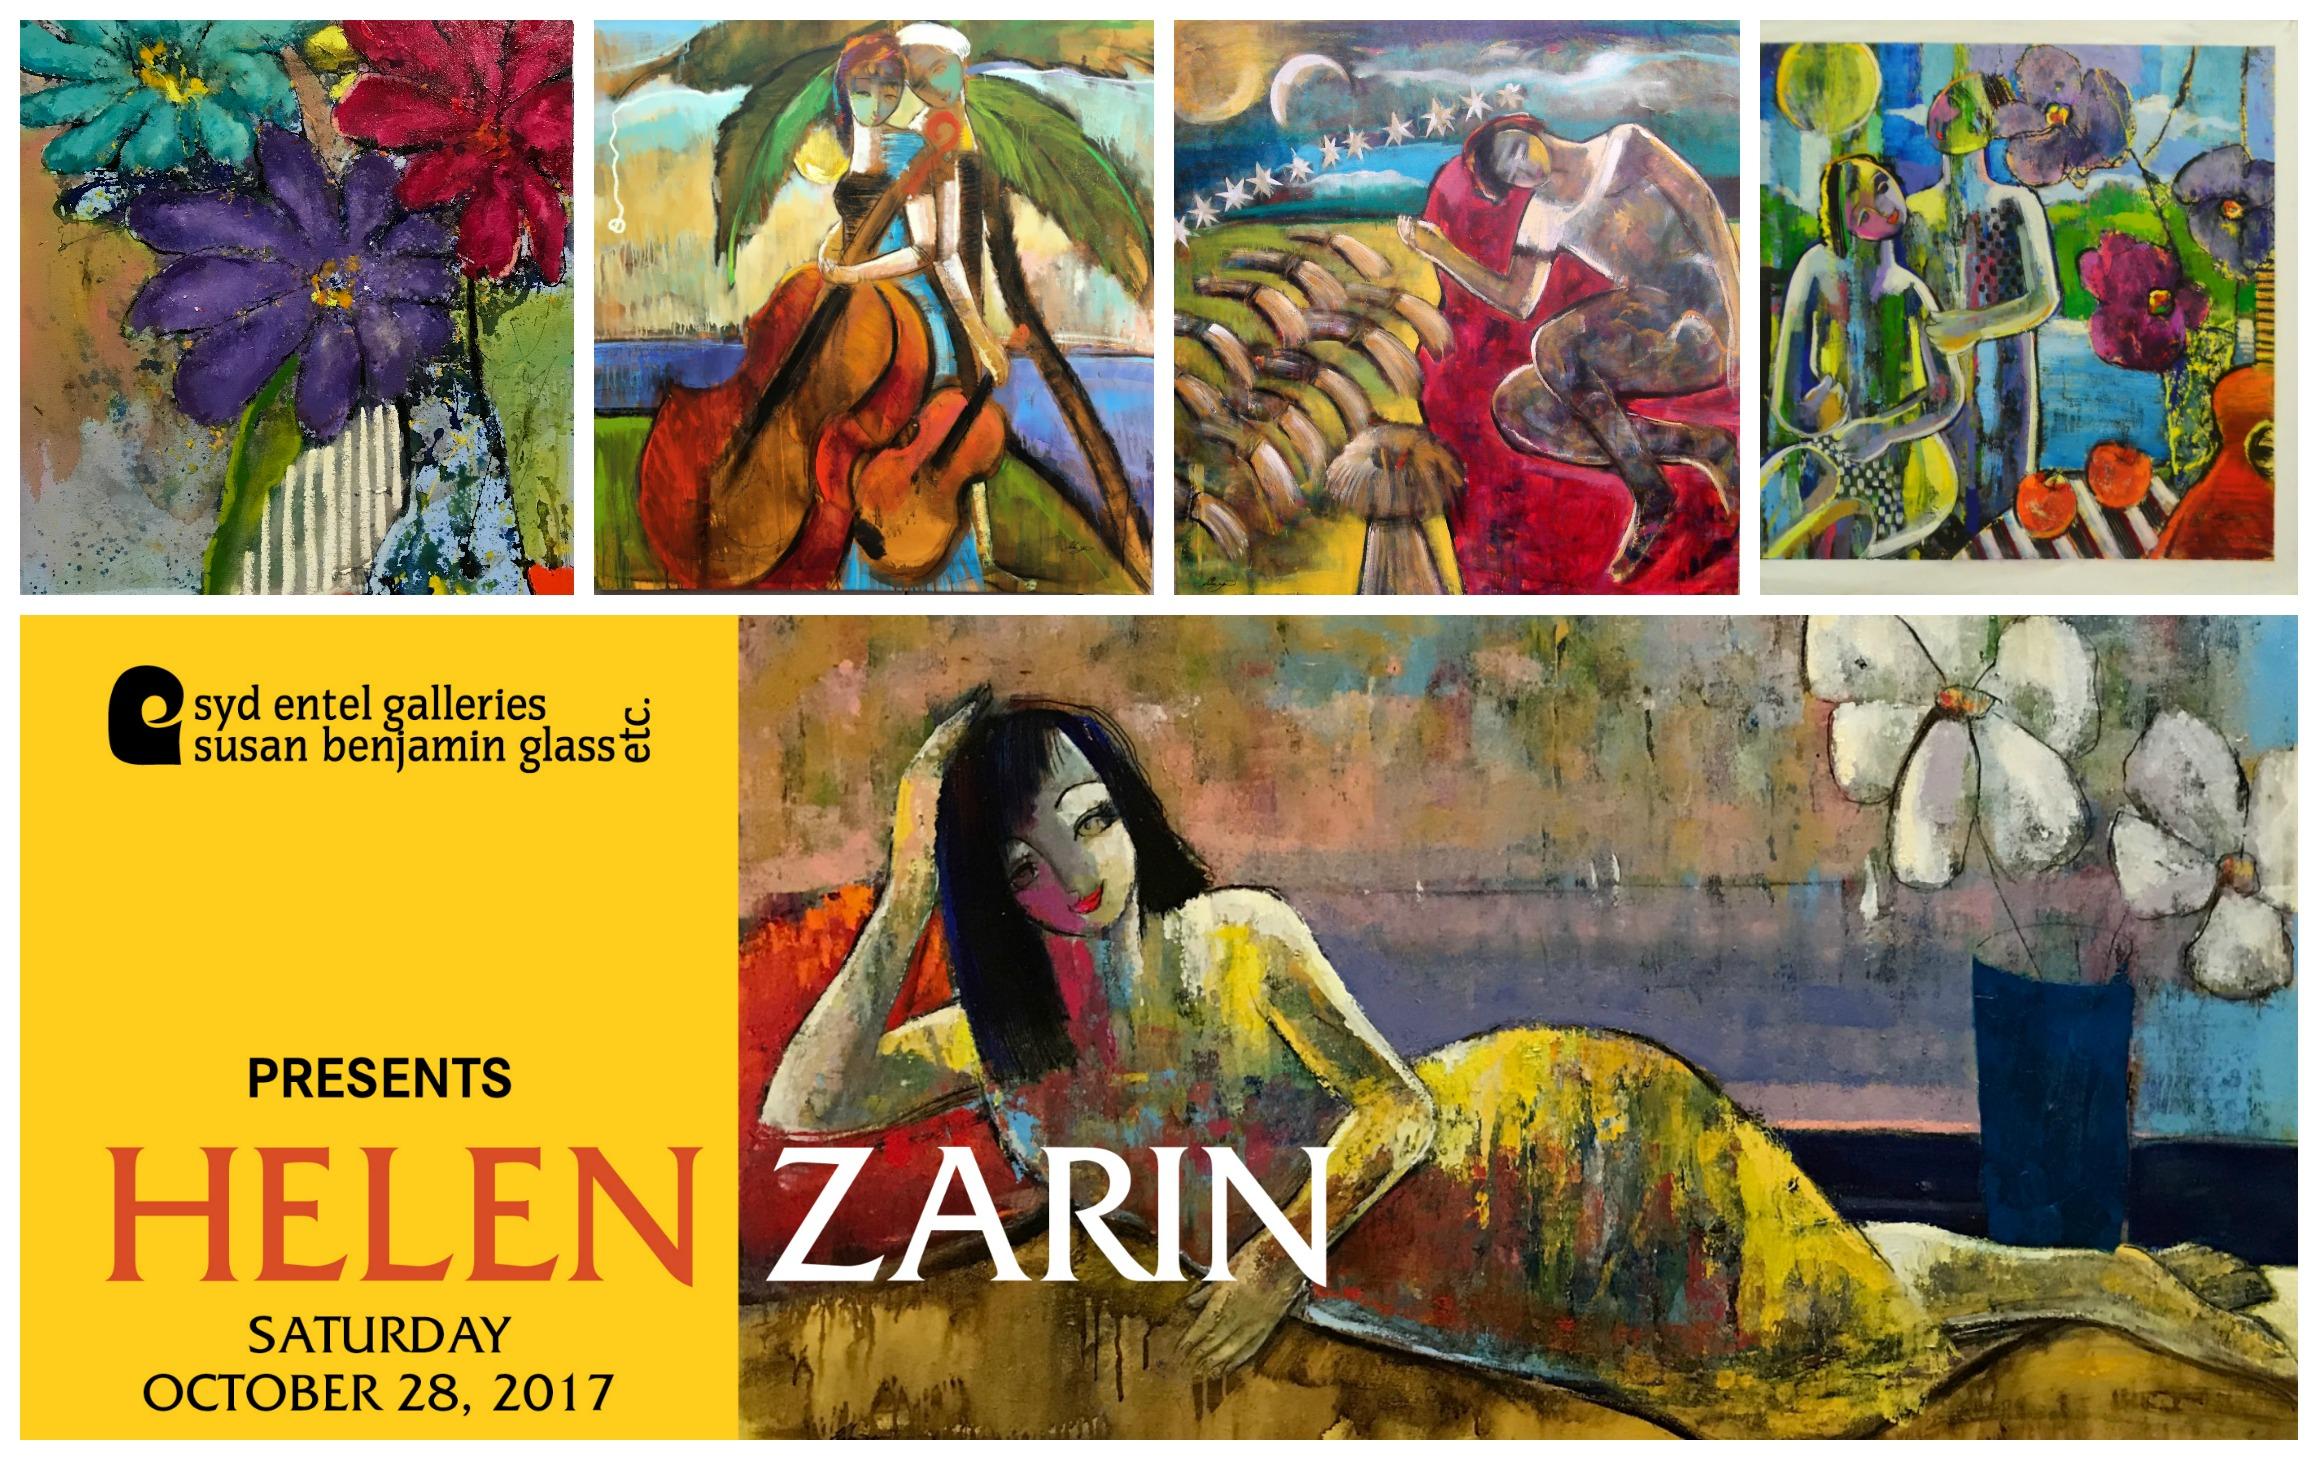 Helen Zarin Show